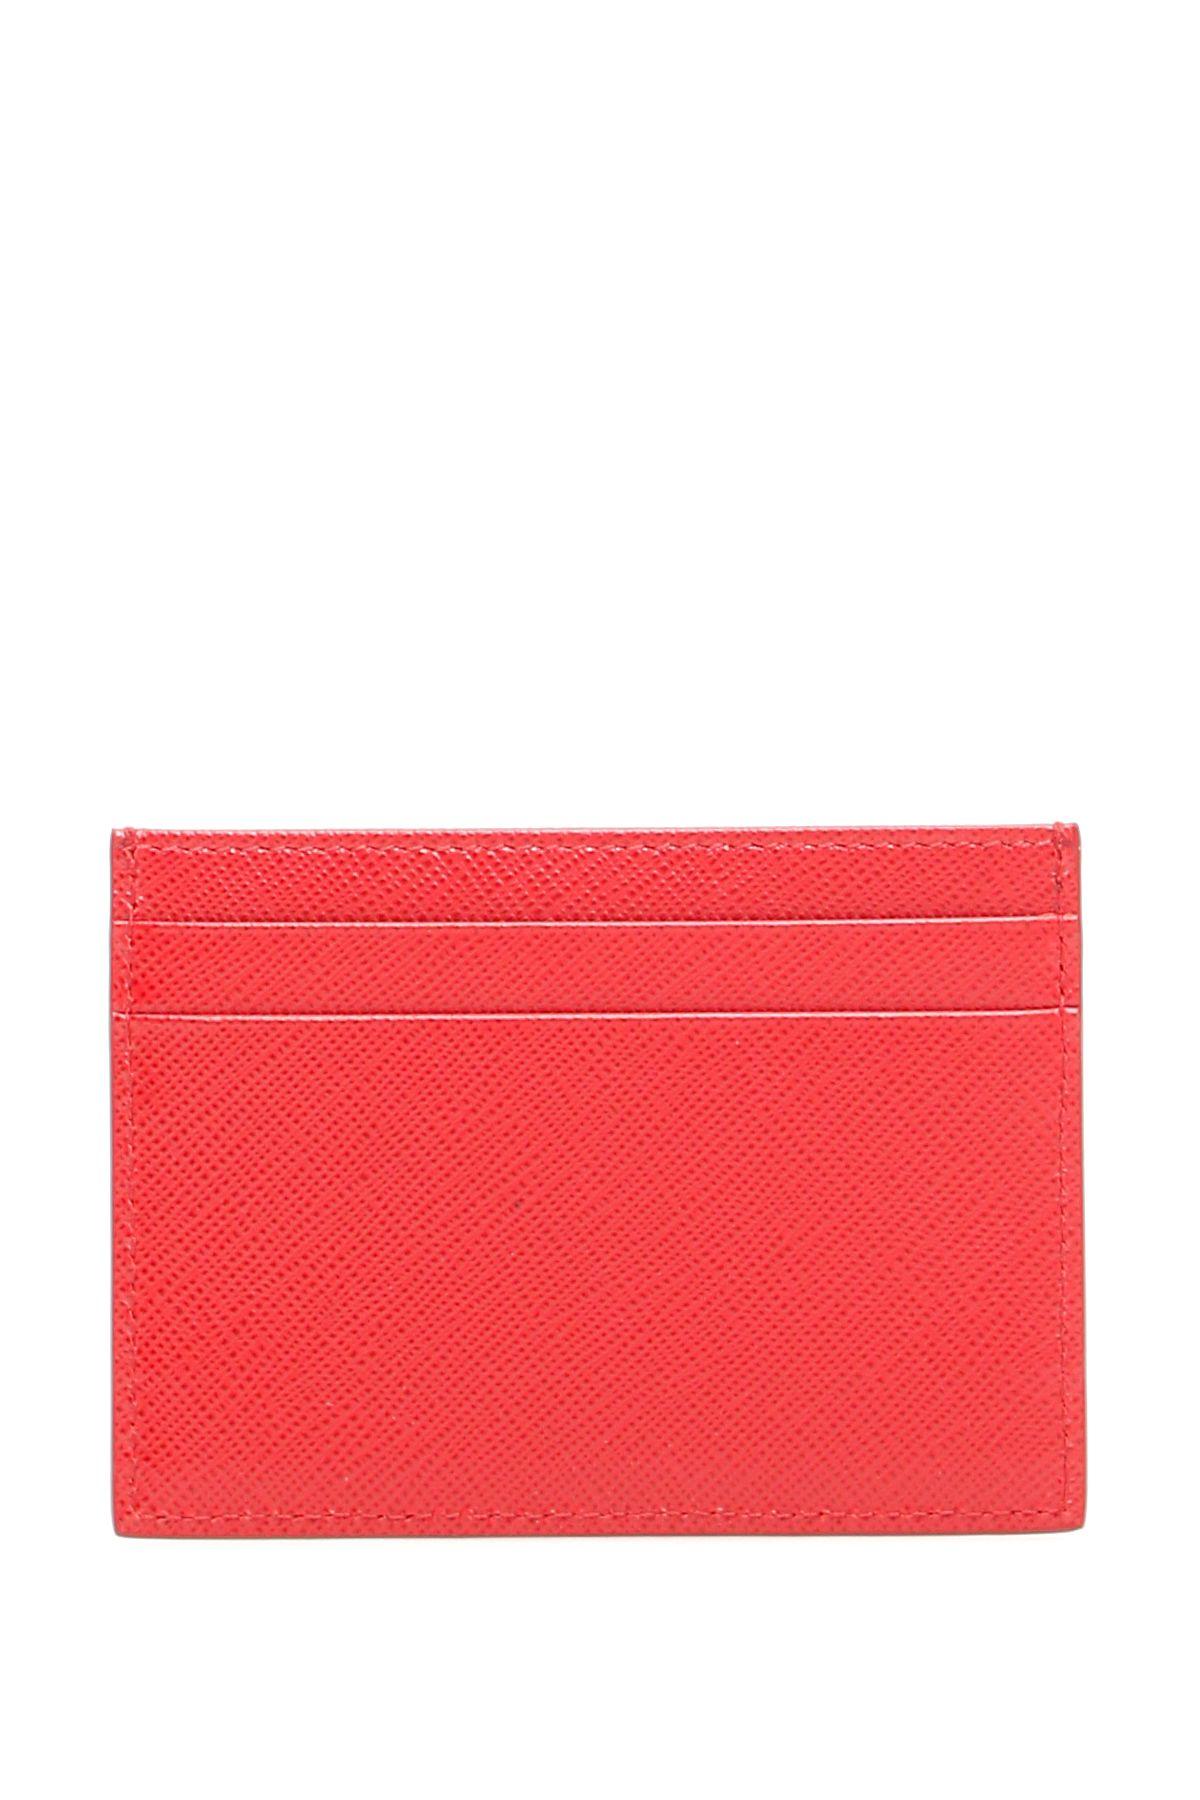 95f1247bed74 Prada Prada Credit Card Holder With Fish Print - FUOCO NERO (Red ...